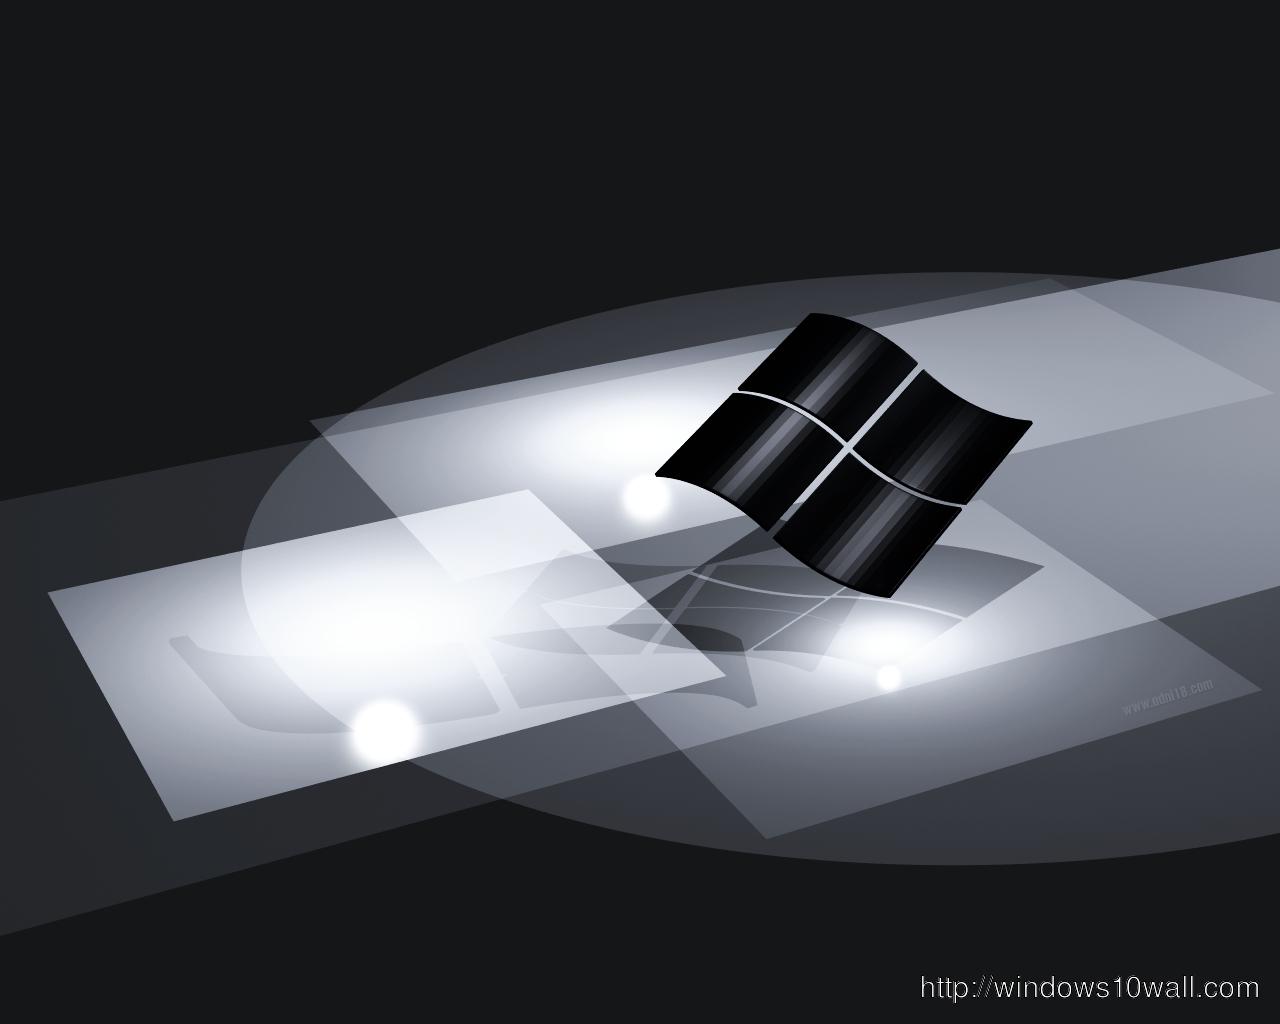 3d wallpaper download for windows